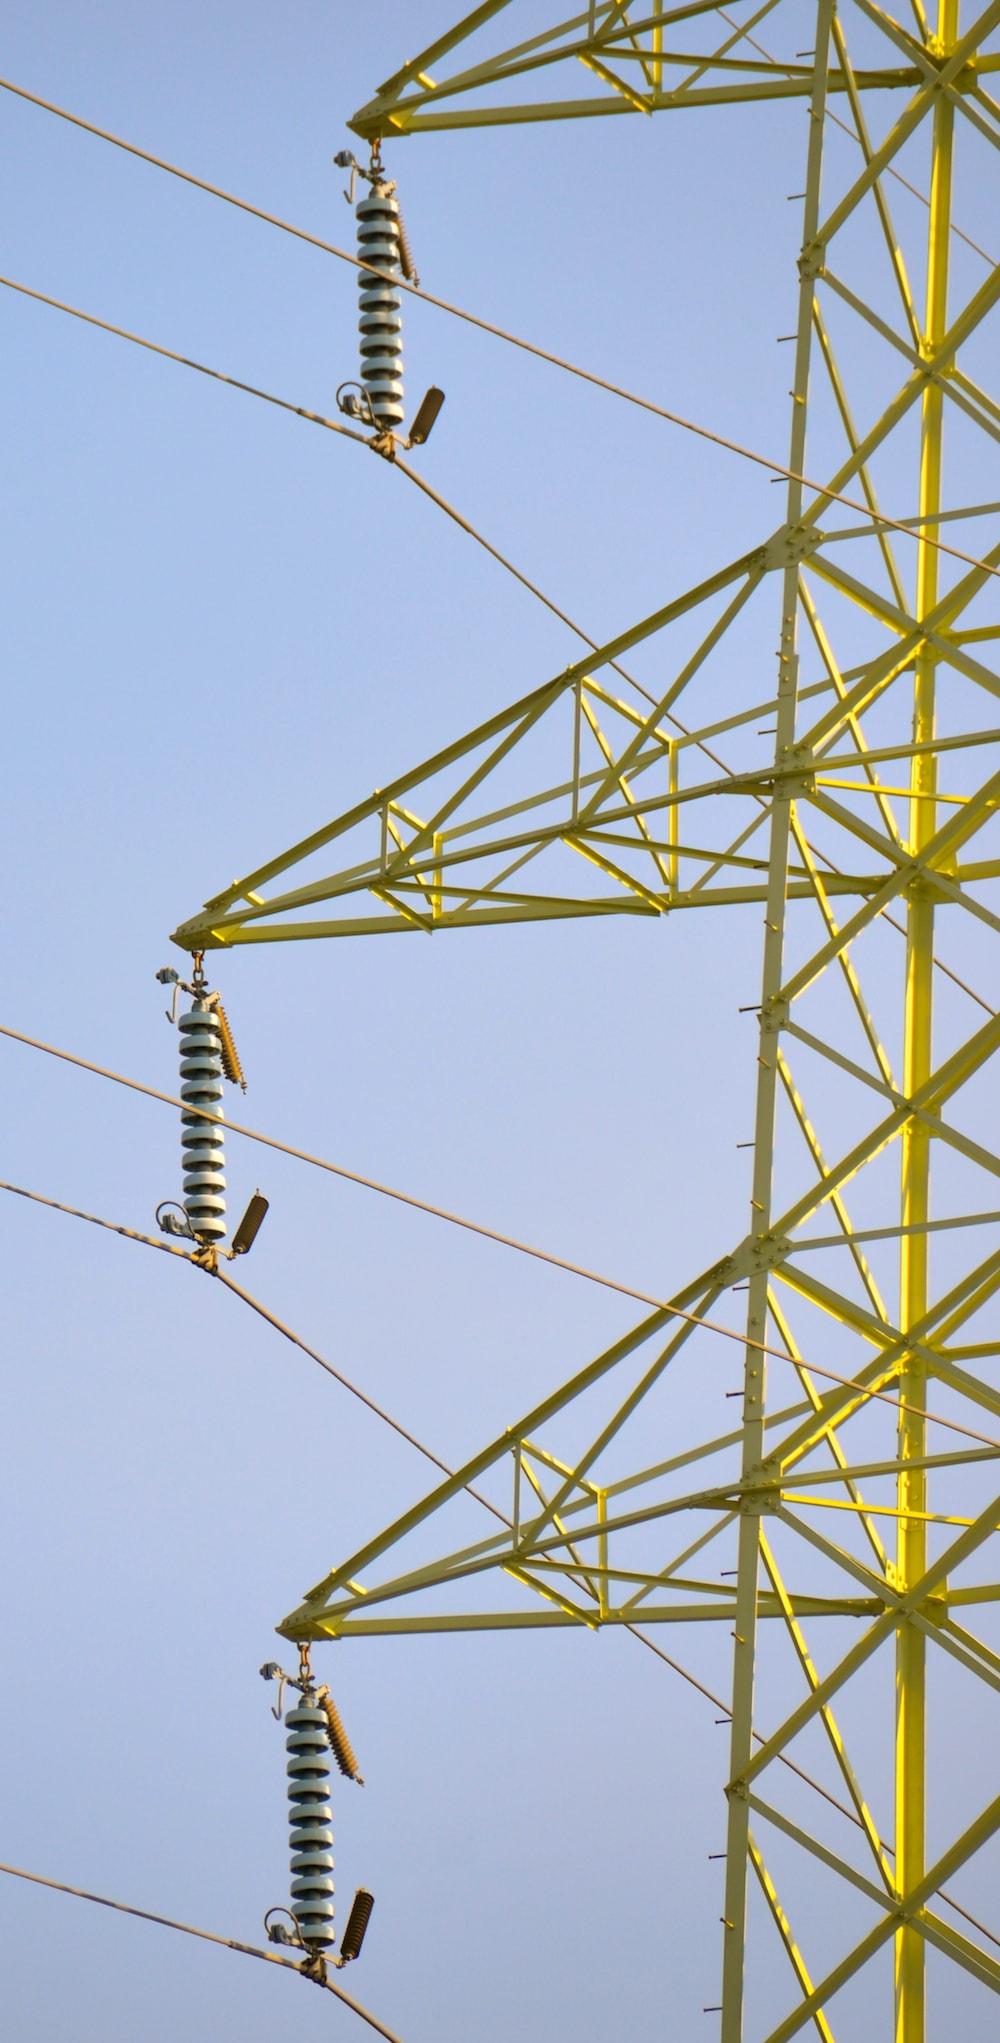 EGLA Switching & Lightning Protection of Overhead Lines Using Externally Gapped Line Arresters EGLAS on transmission line in Korea